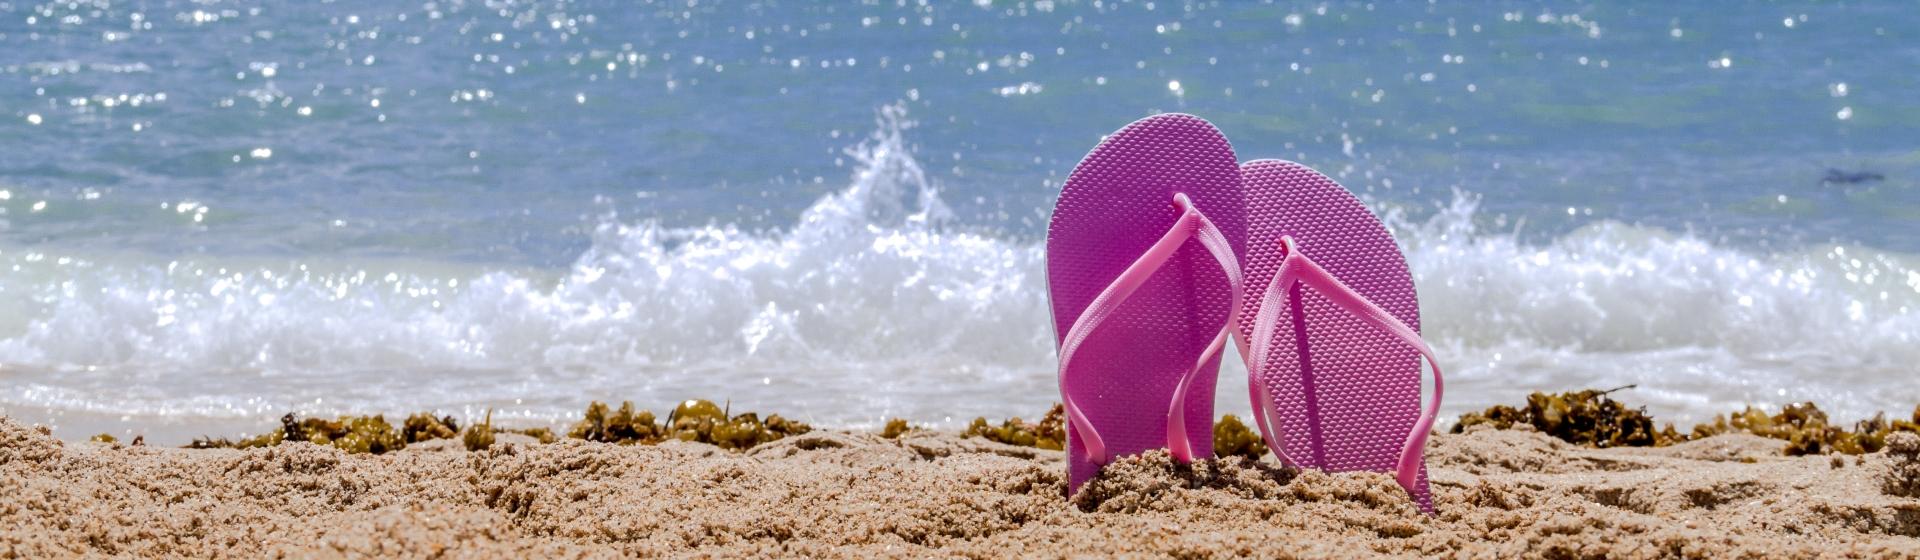 Pasajes baratos a la playa